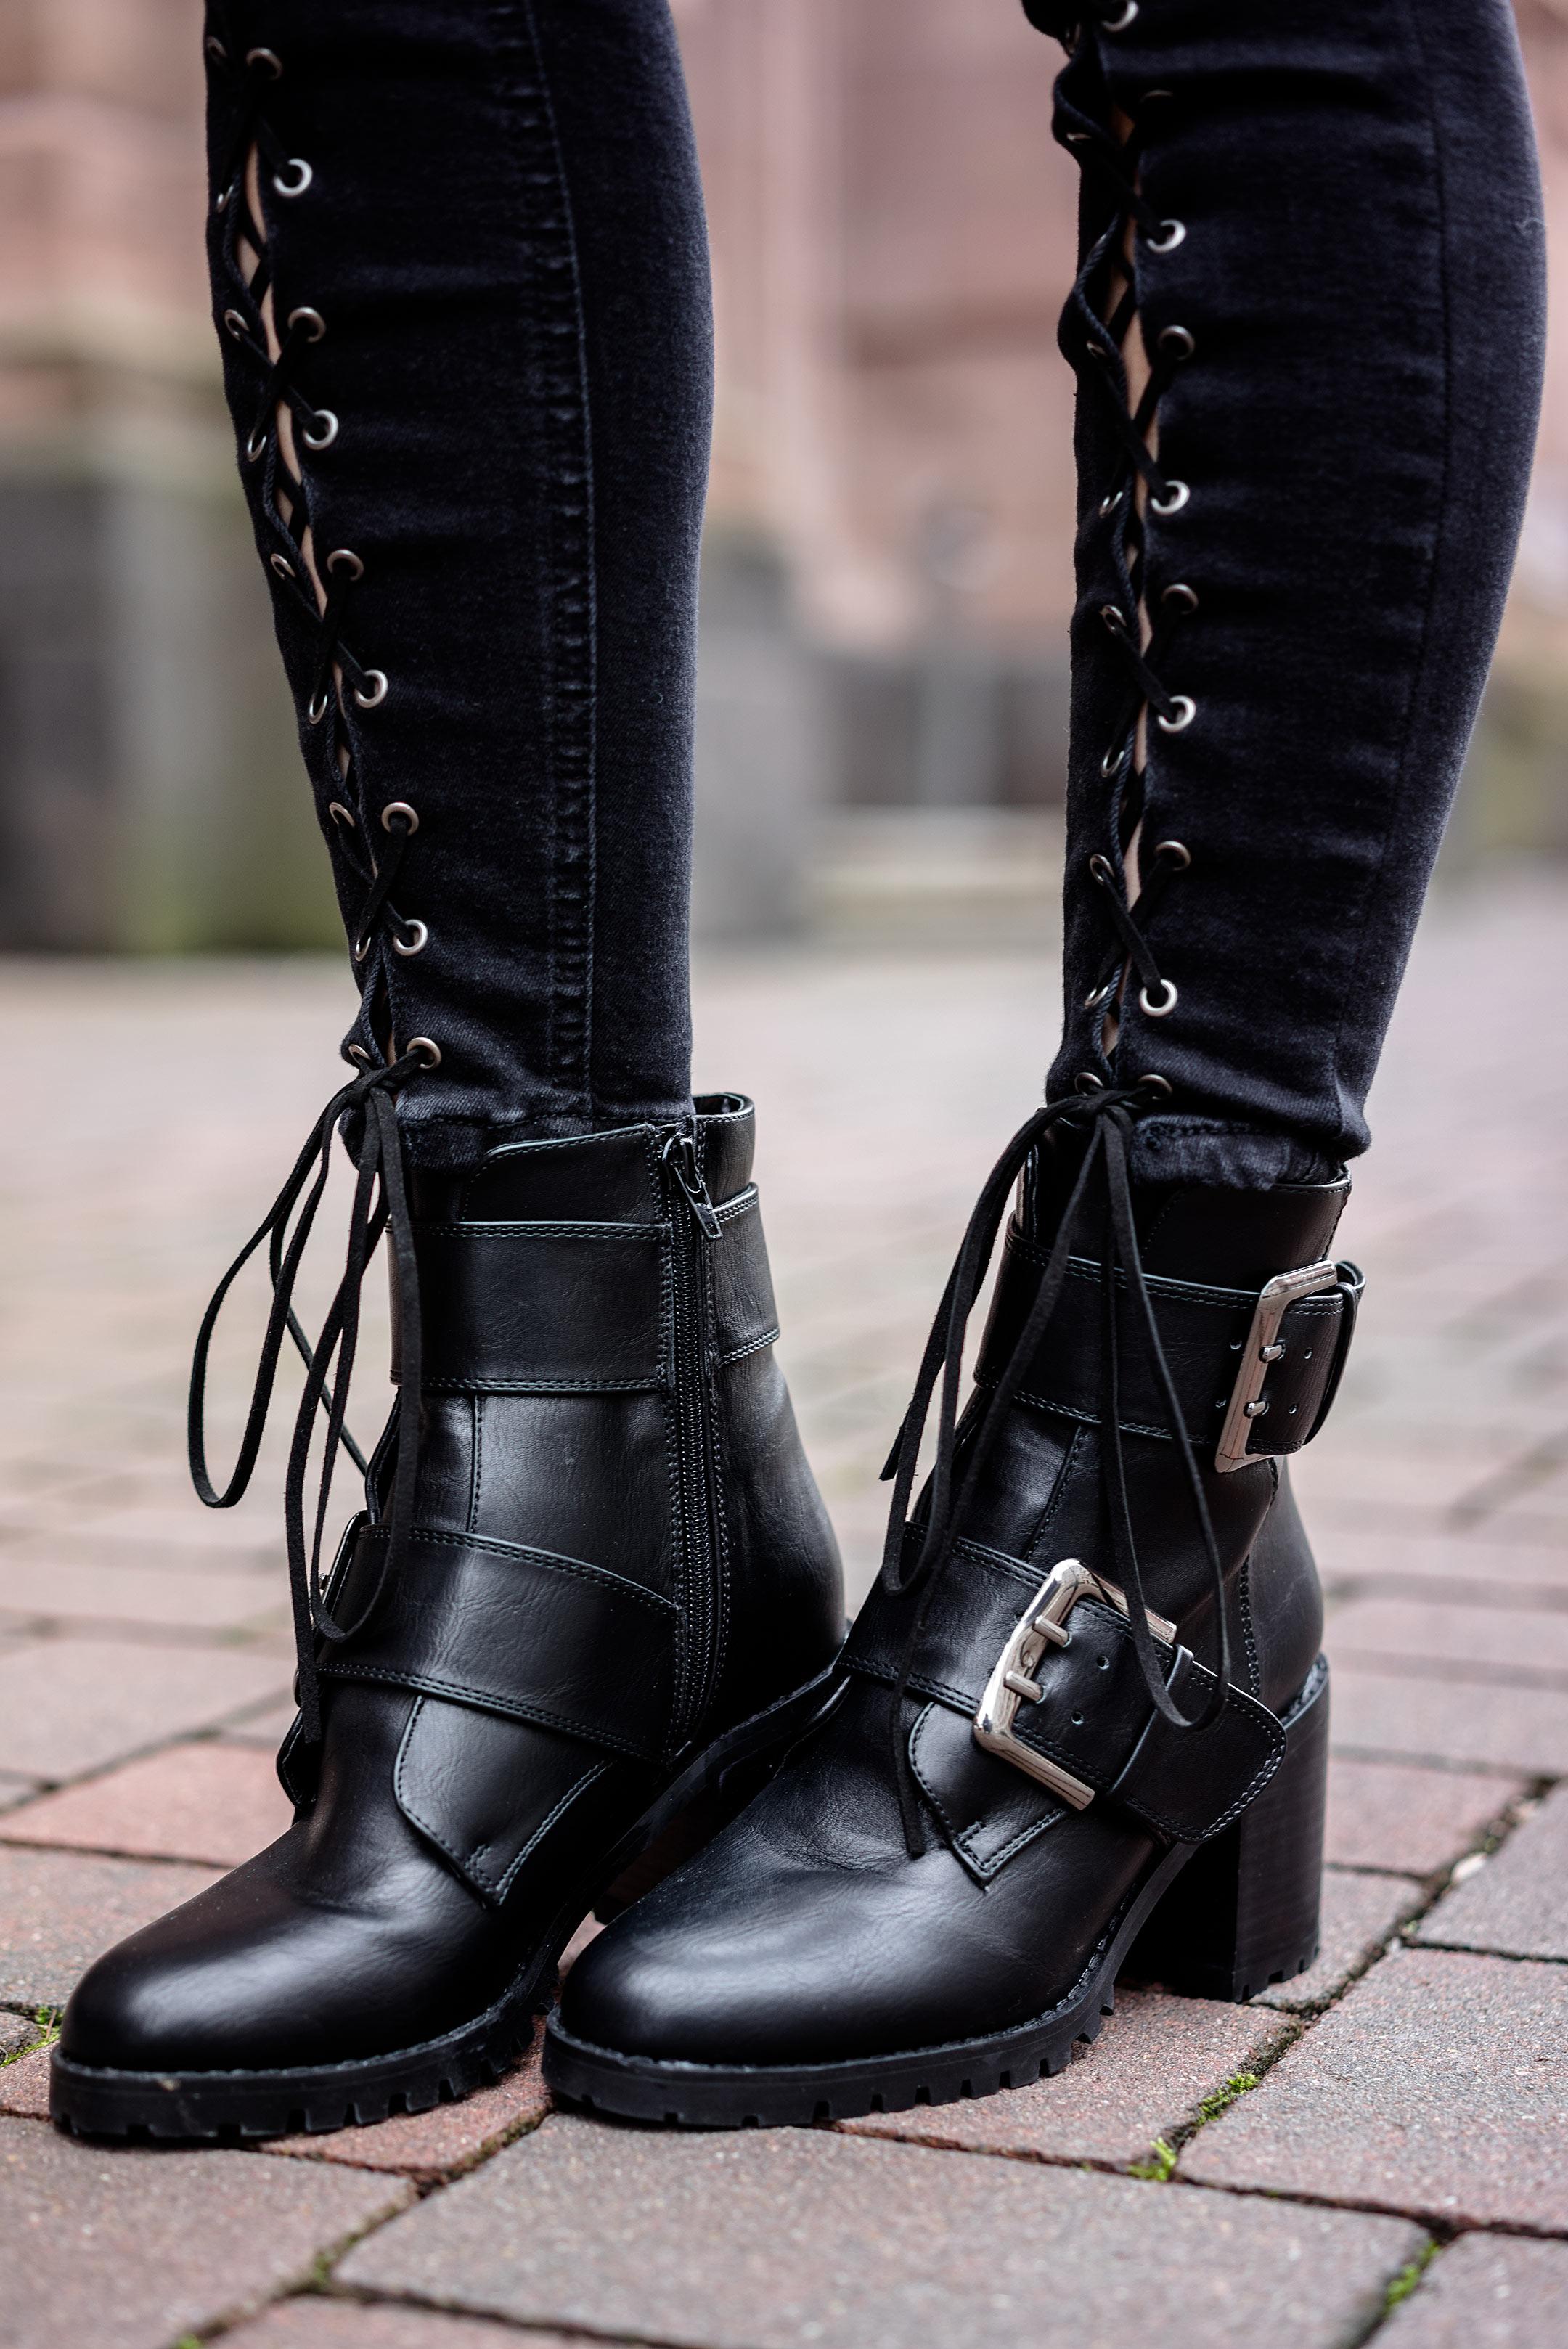 Buffalo Leder Boots schwarz Stiefeletten mit Absatz Sunnyinga Blog